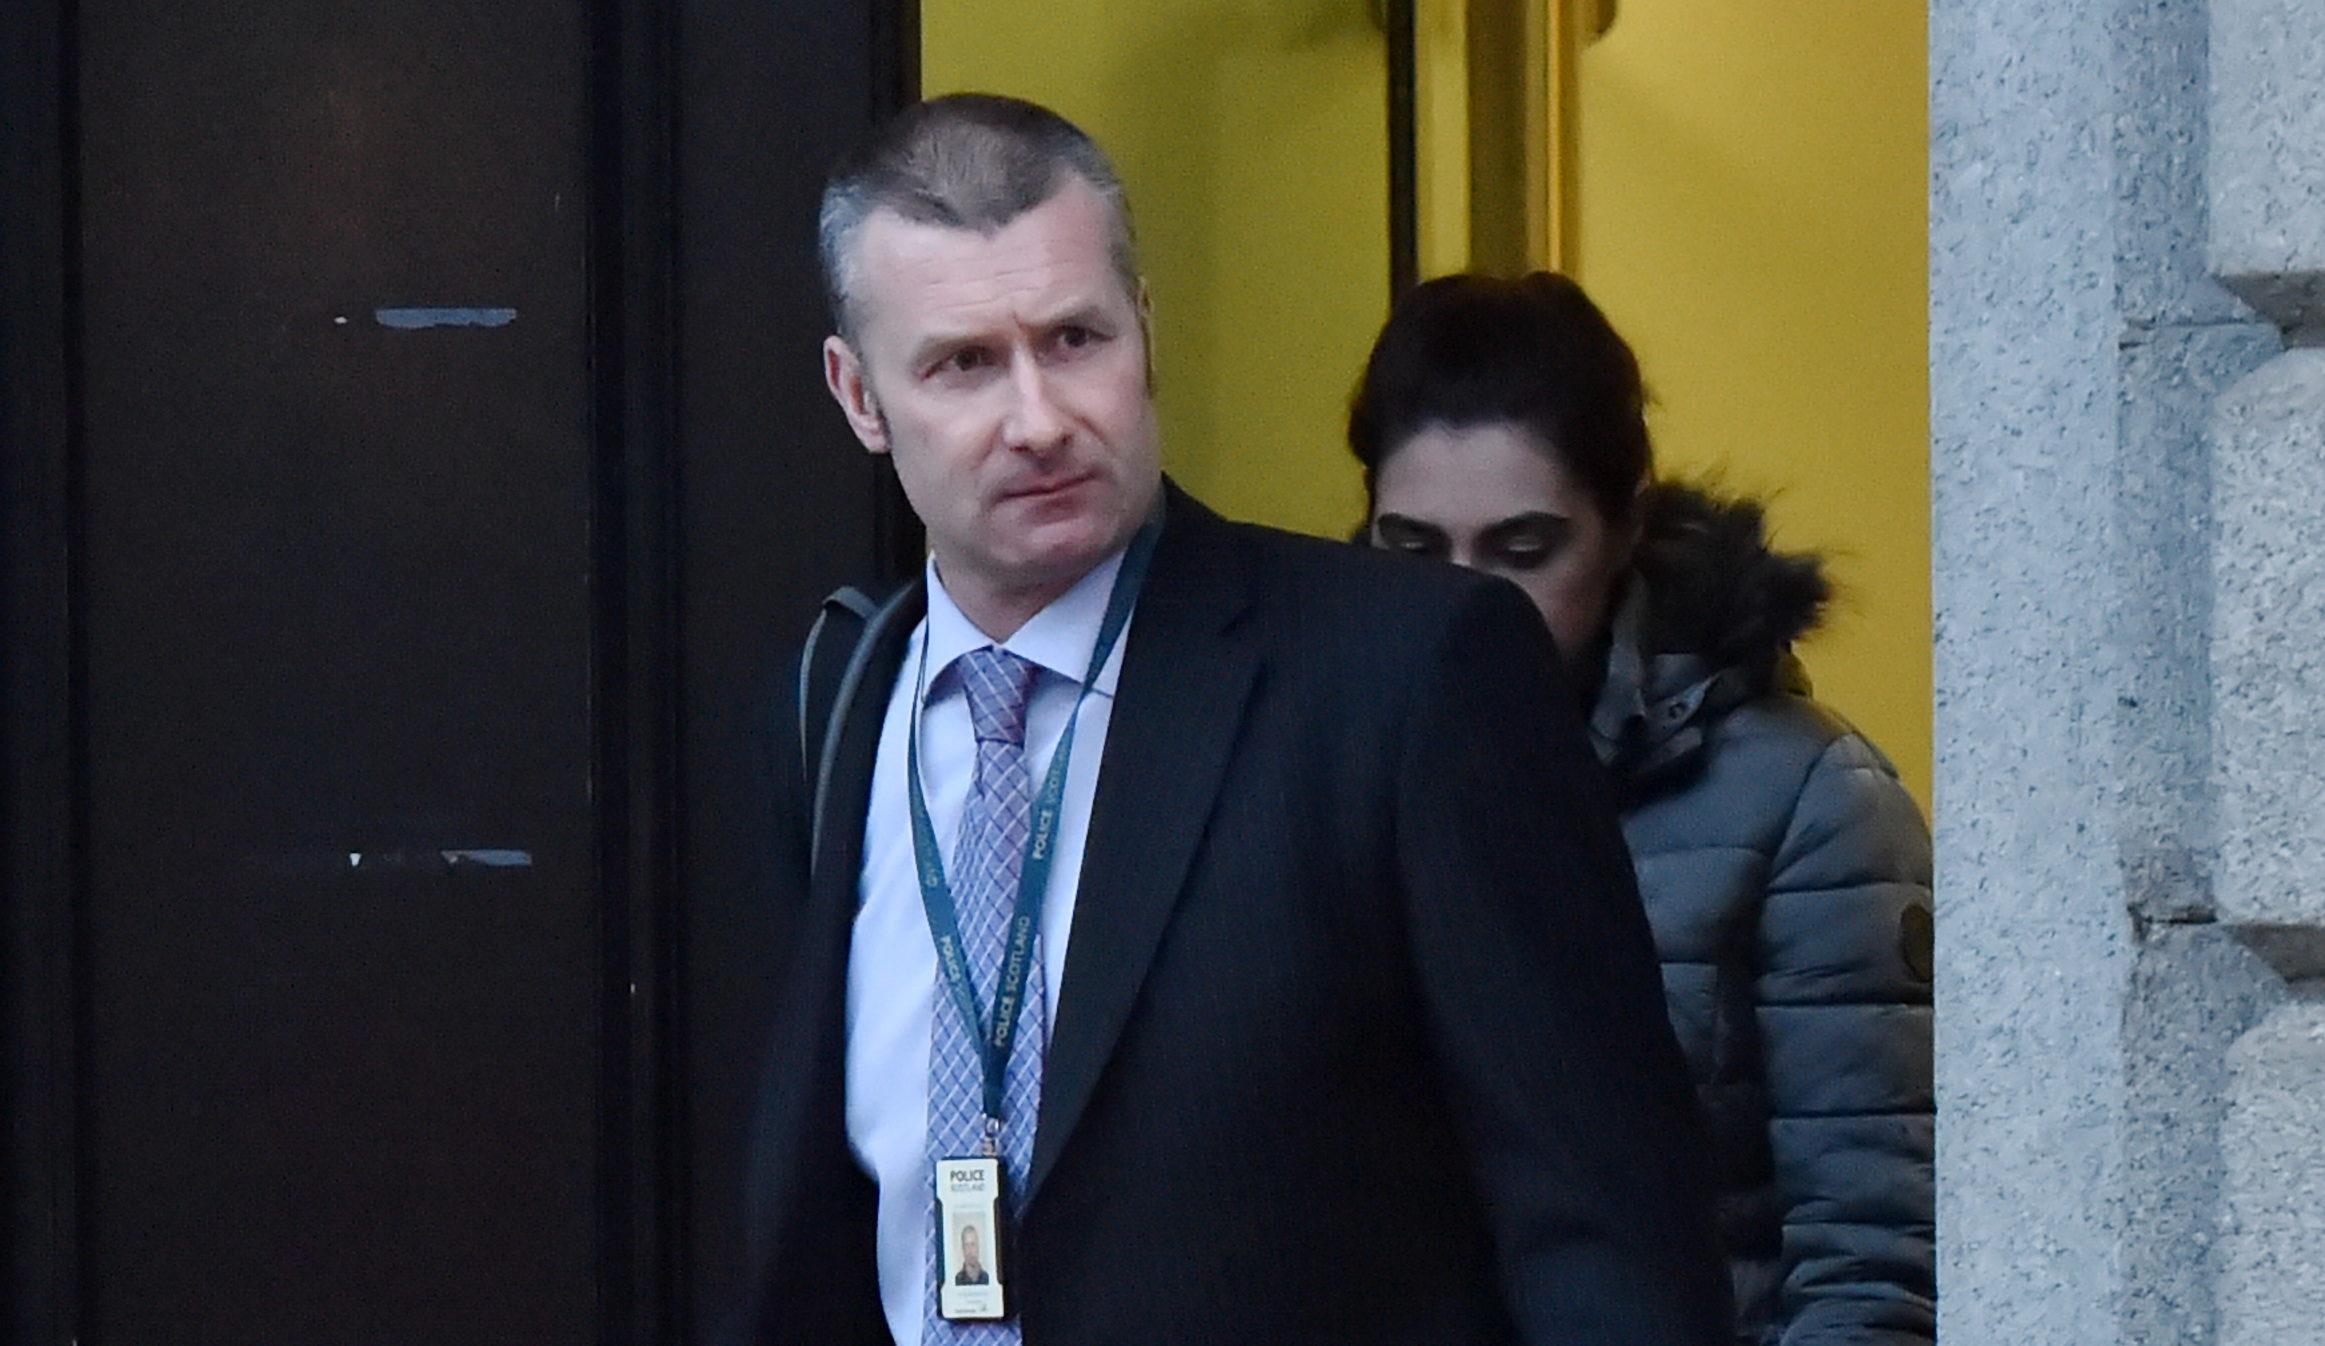 Collision investigator PC Andrew Ramsey.